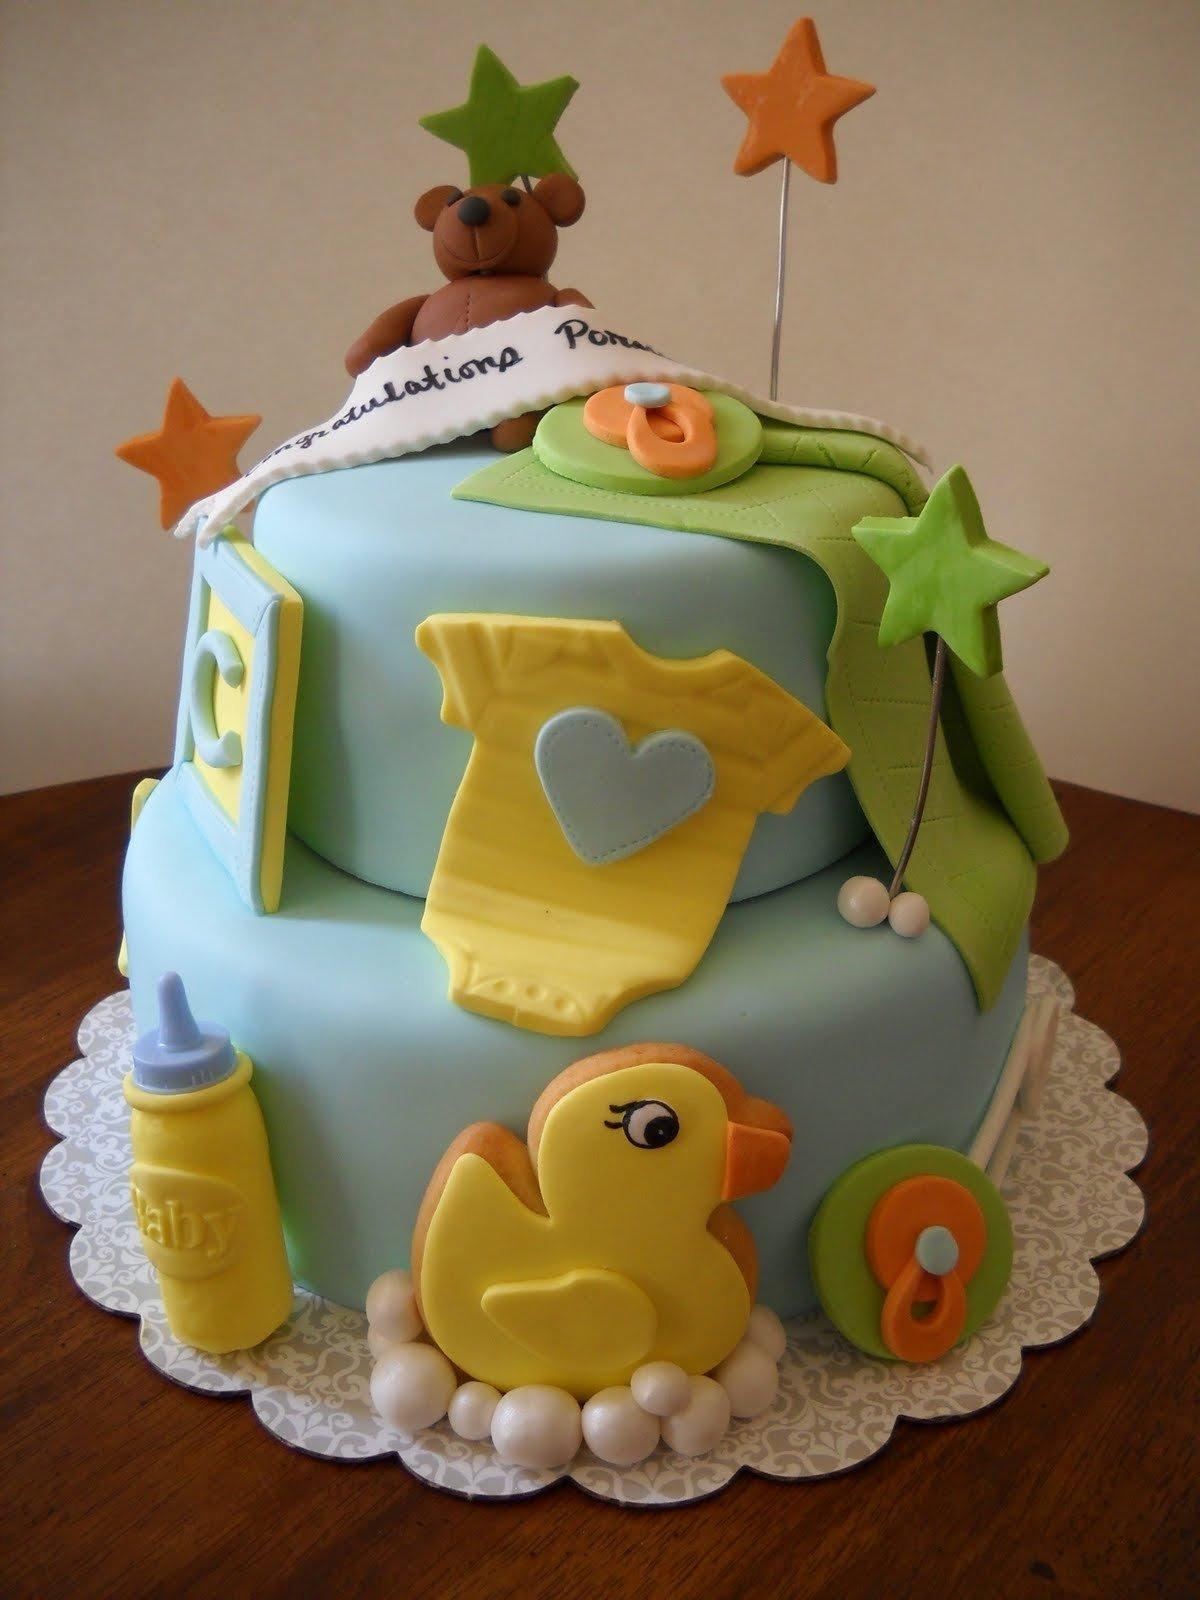 10 Ideal Baby Shower Cake Decoration Ideas google ceb1cf80cebfcf84ceb5cebbceadcf83cebcceb1cf84ceb1 eceb9cebacf8ccebdcf89cebd ceb3ceb9ceb1 http 2 bp blogspot   2021